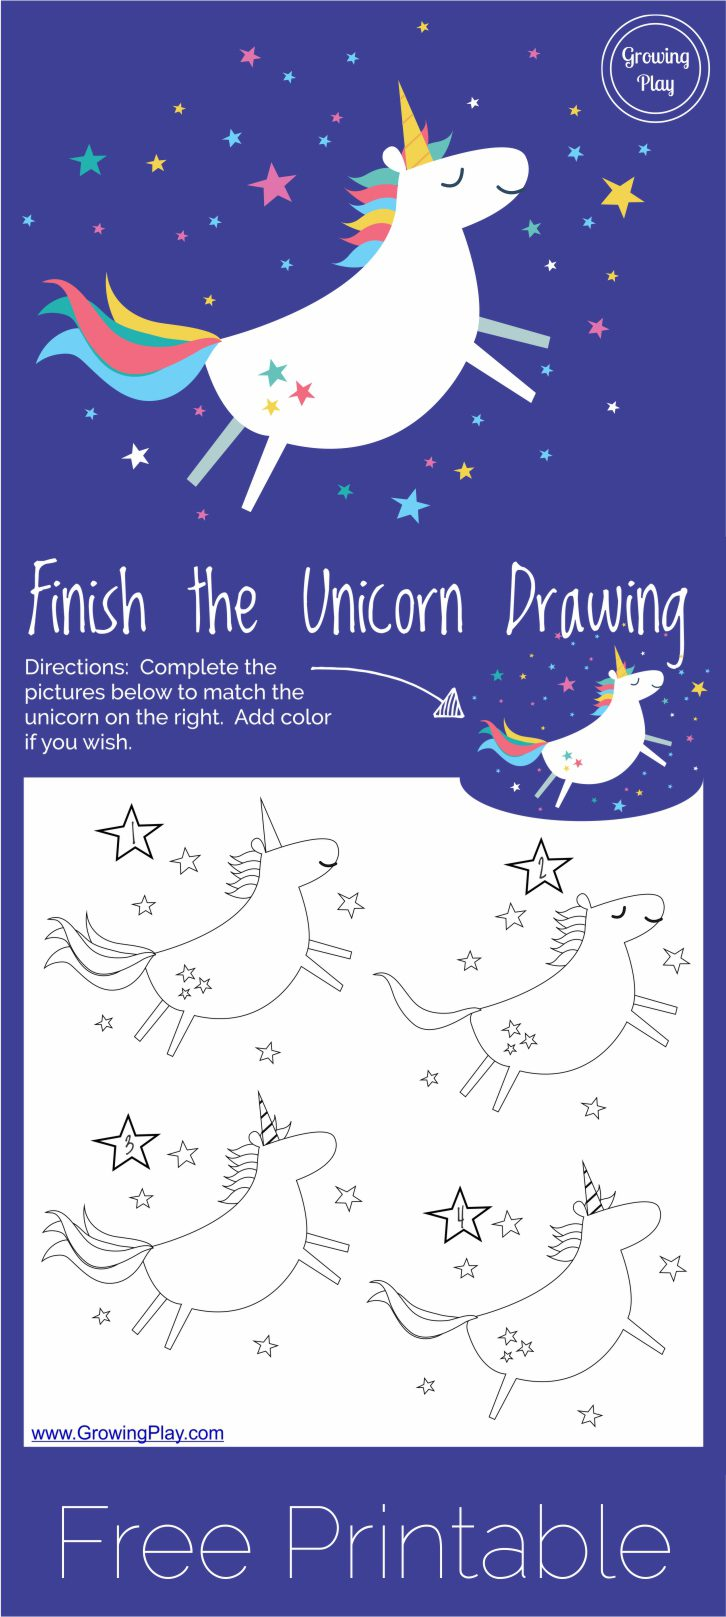 Finish the Unicorn Drawing